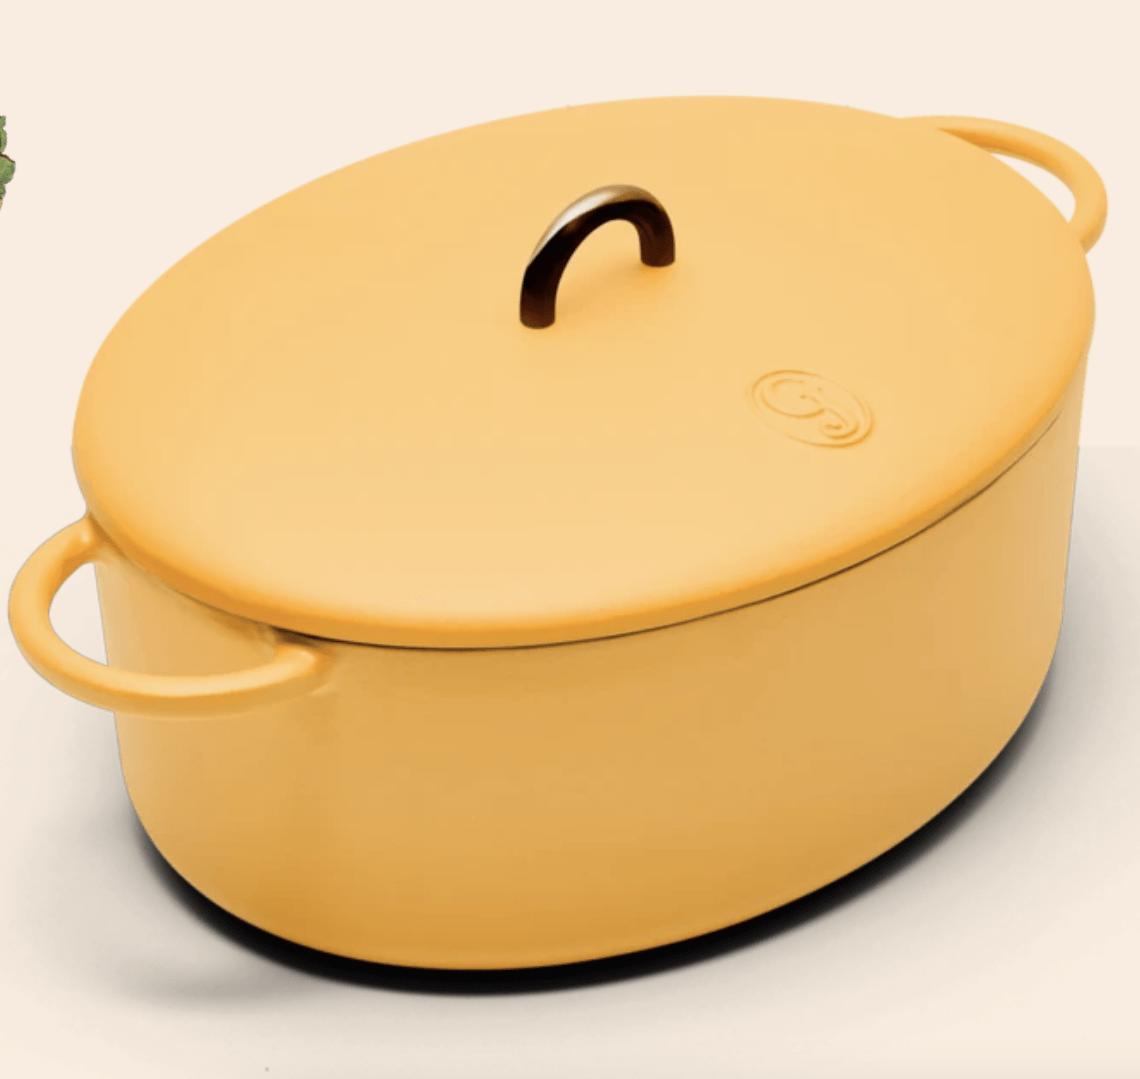 the dutchess dutch oven in mustard